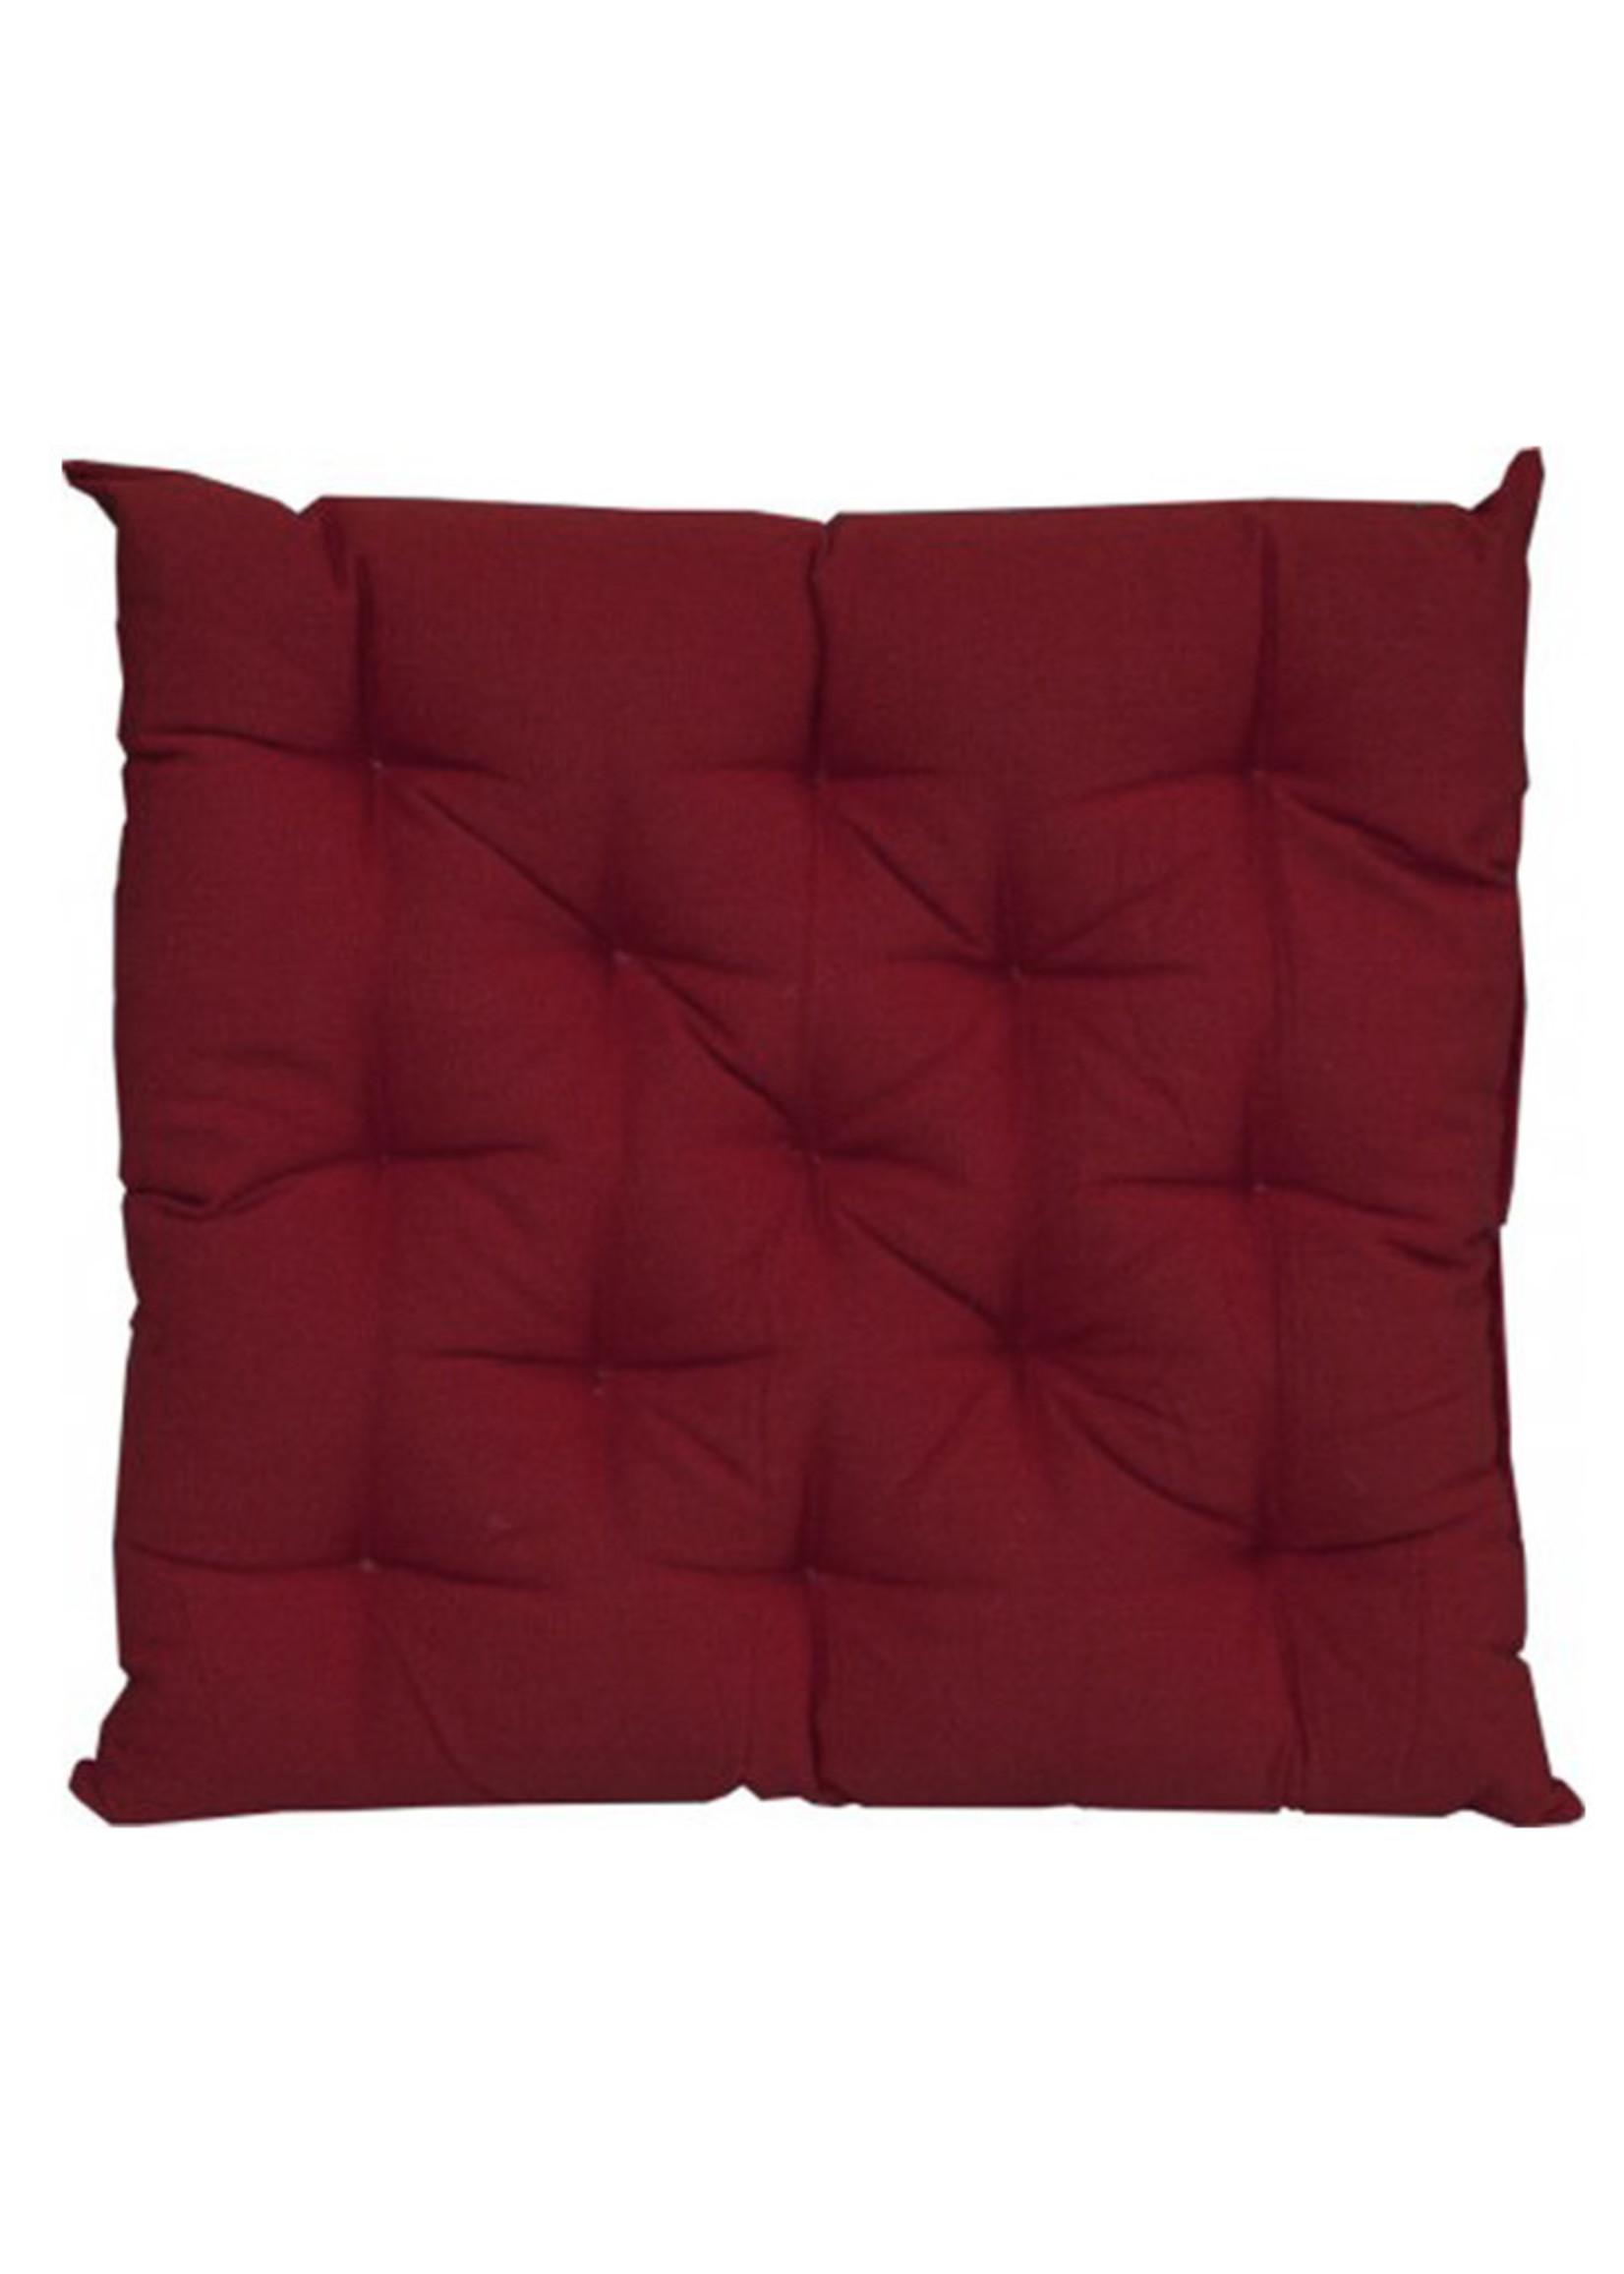 Craft Studio Canvas Reddy Red Chair Pad 40x40cm